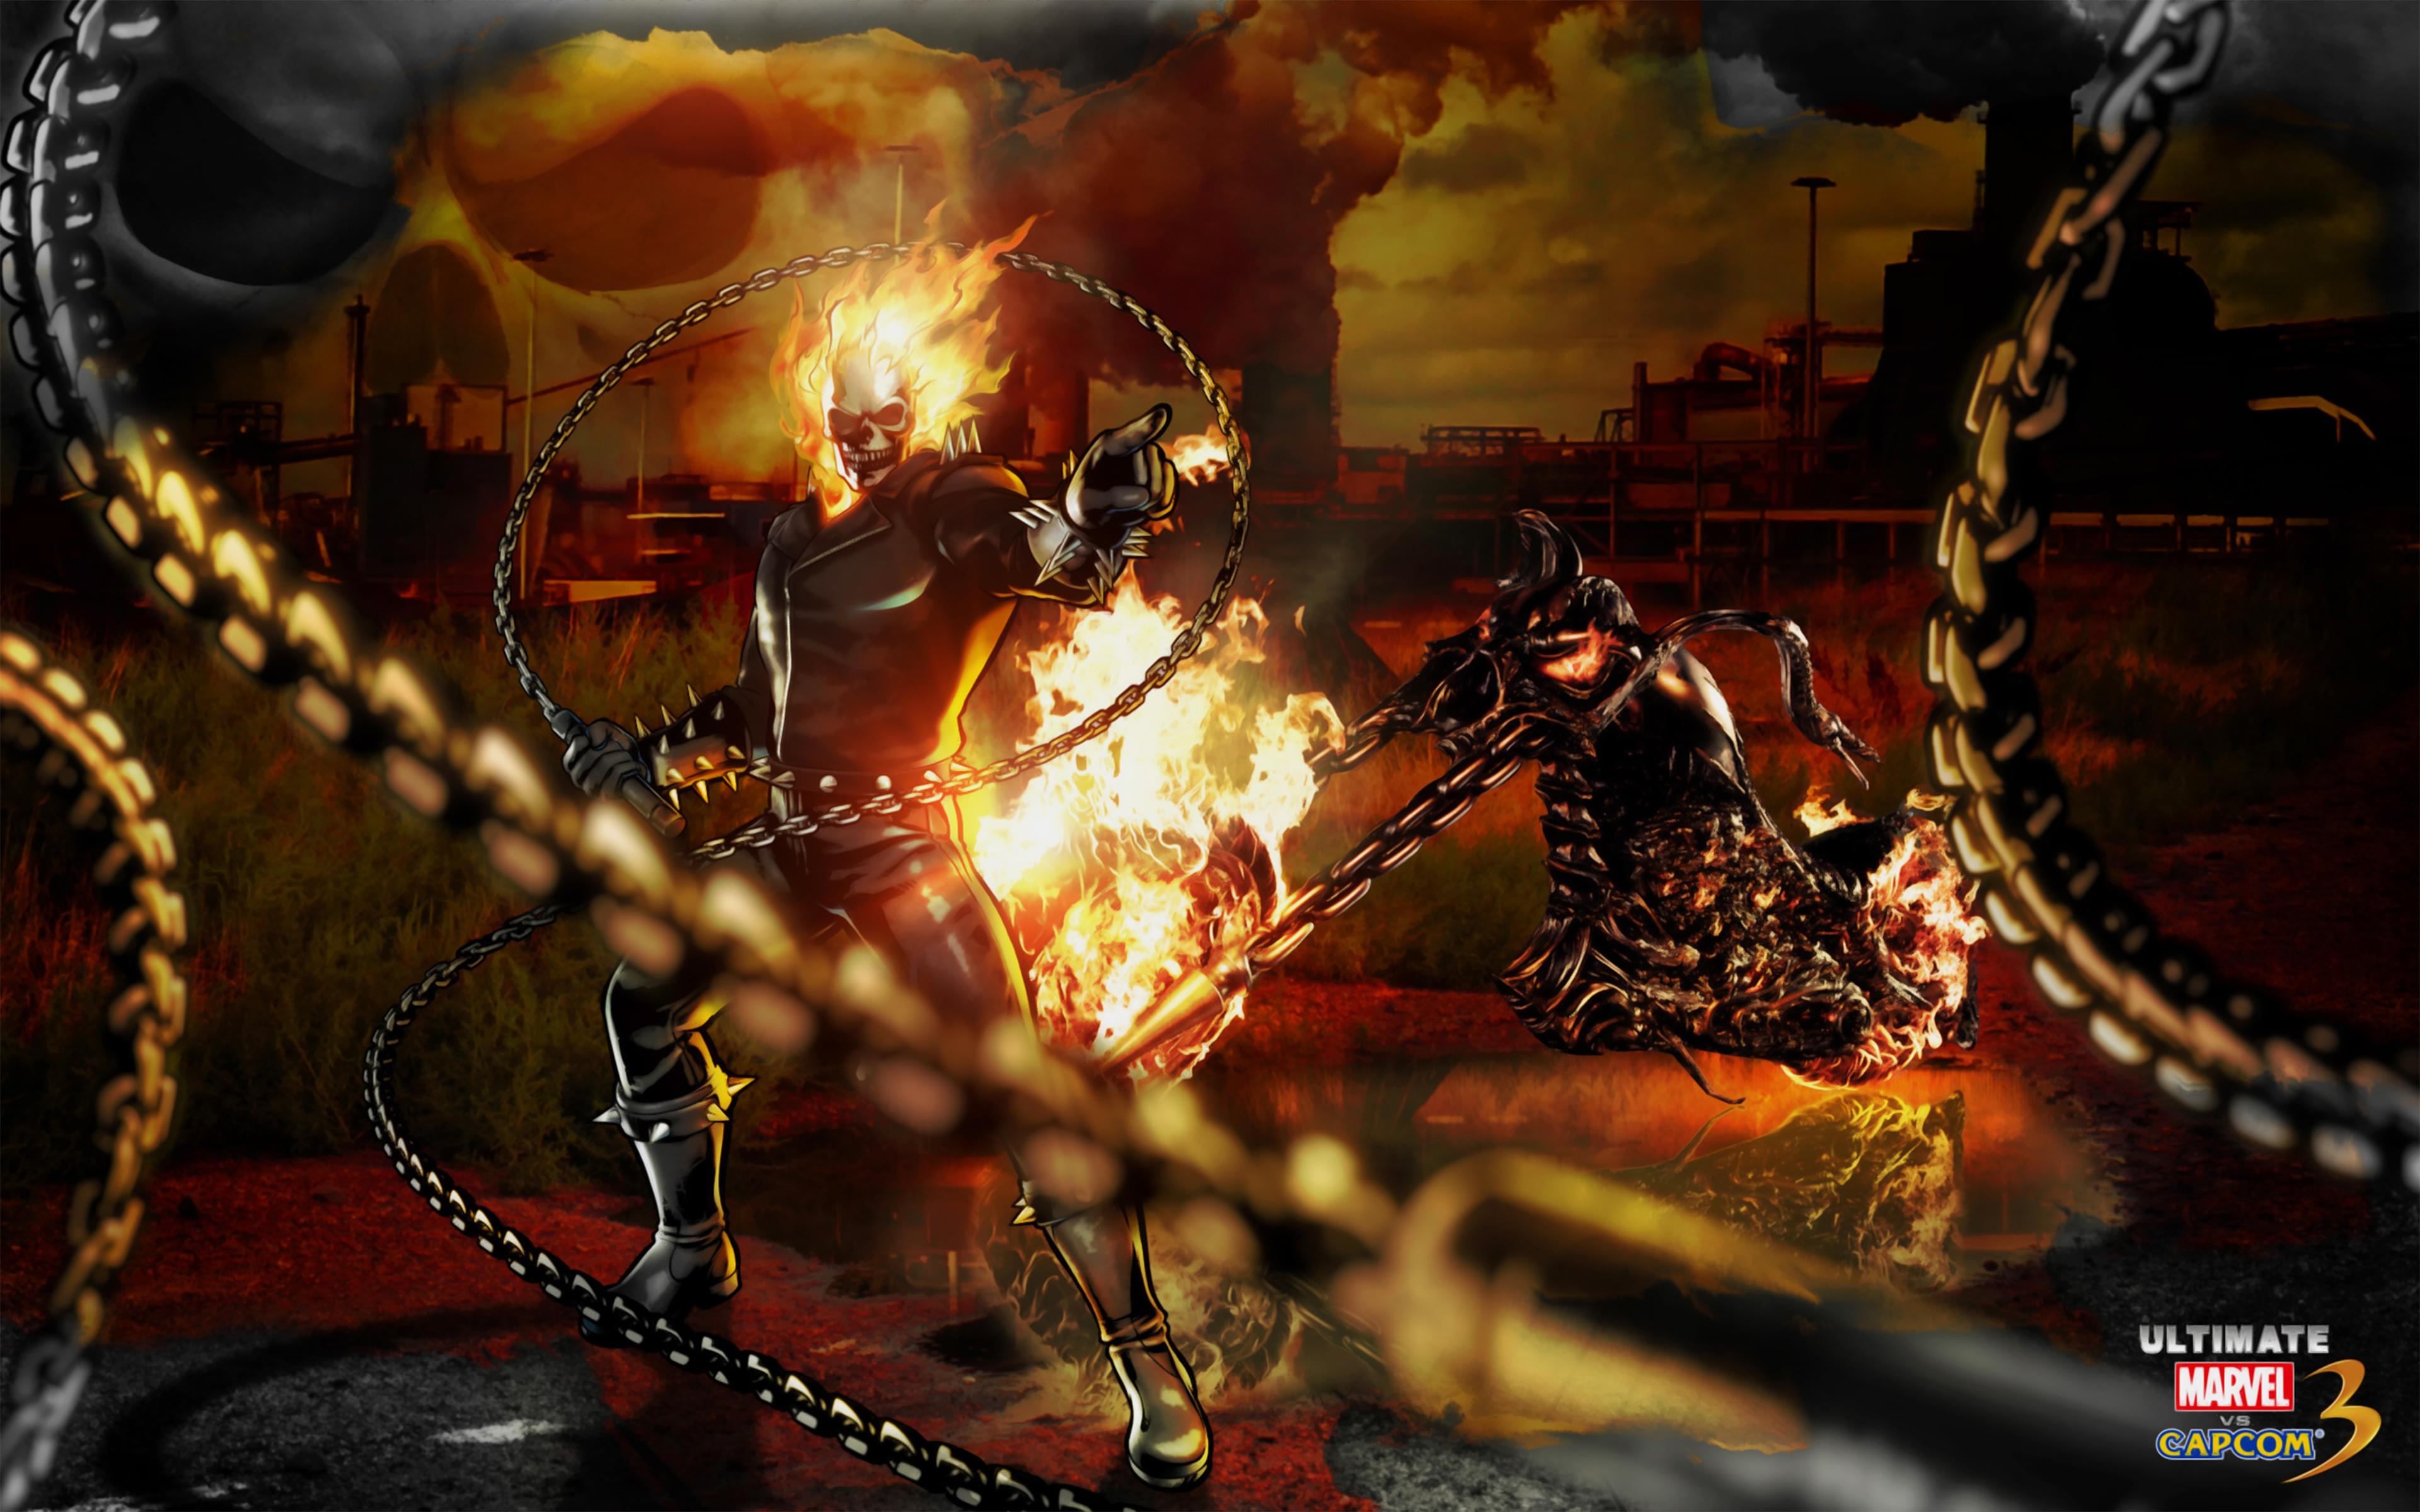 15 Ultimate Marvel Vs Capcom 3 Hd Wallpapers Background Images